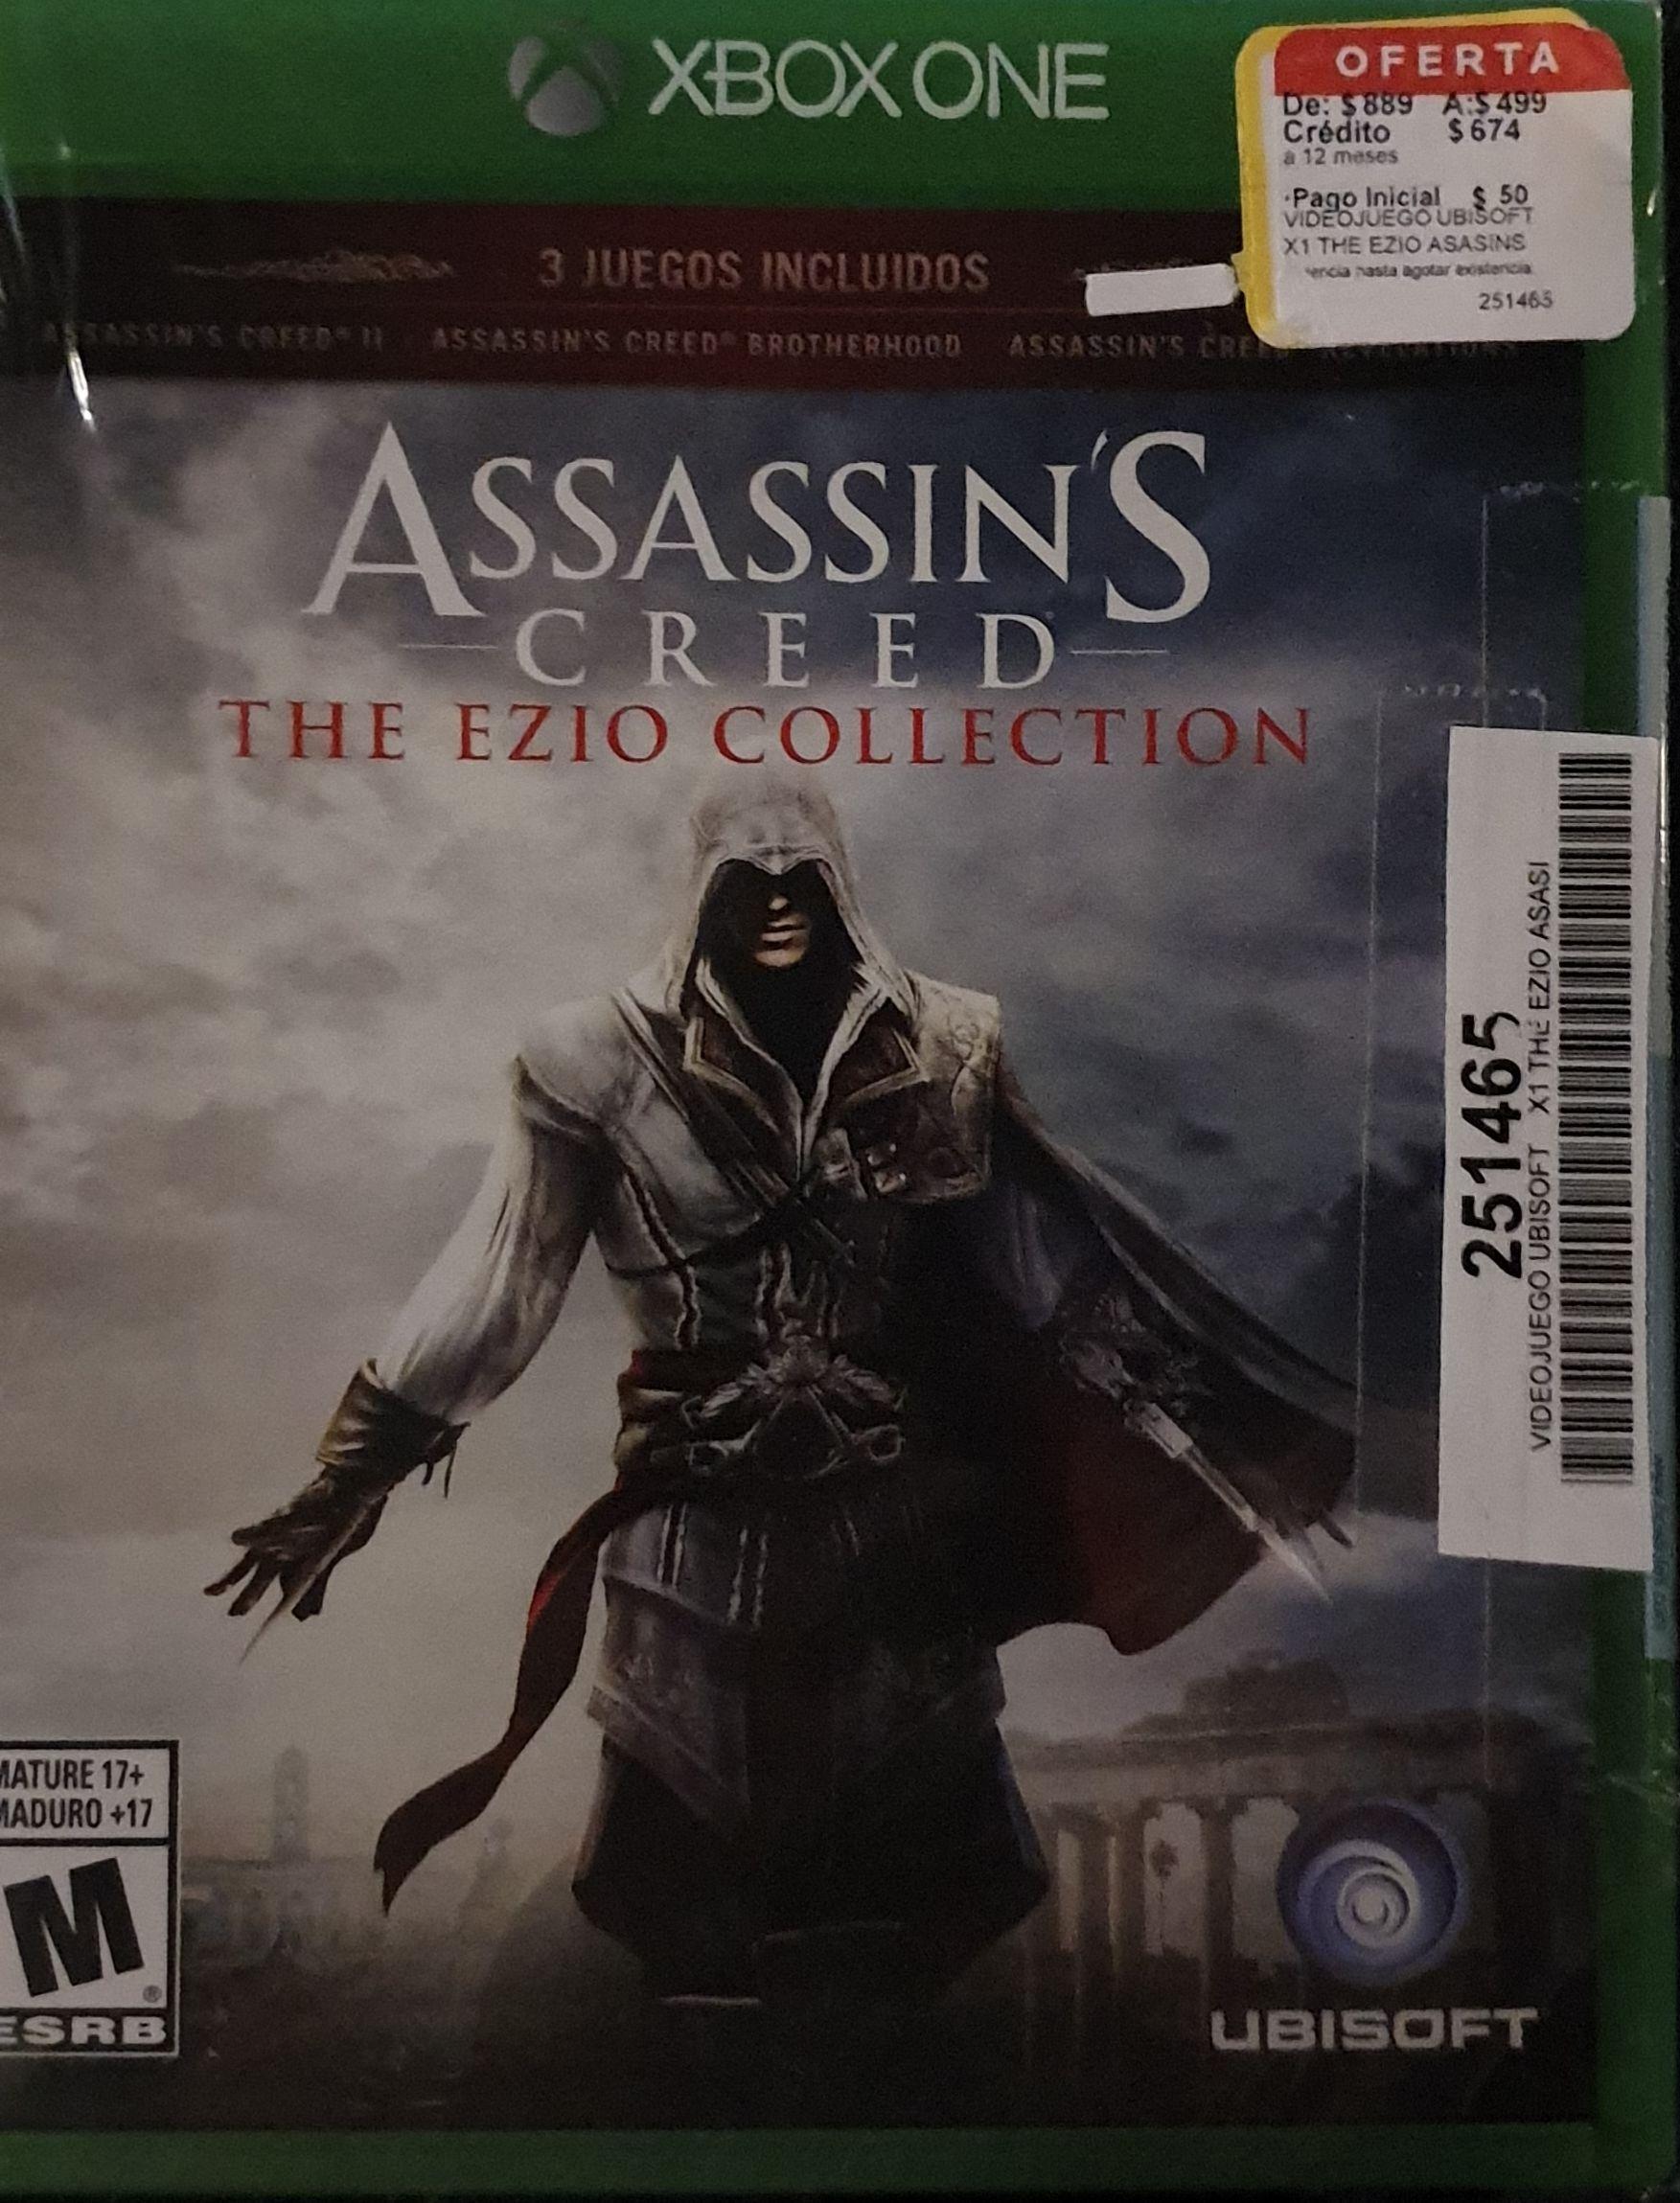 Coppel: Assassins Creed The Ezio Collection